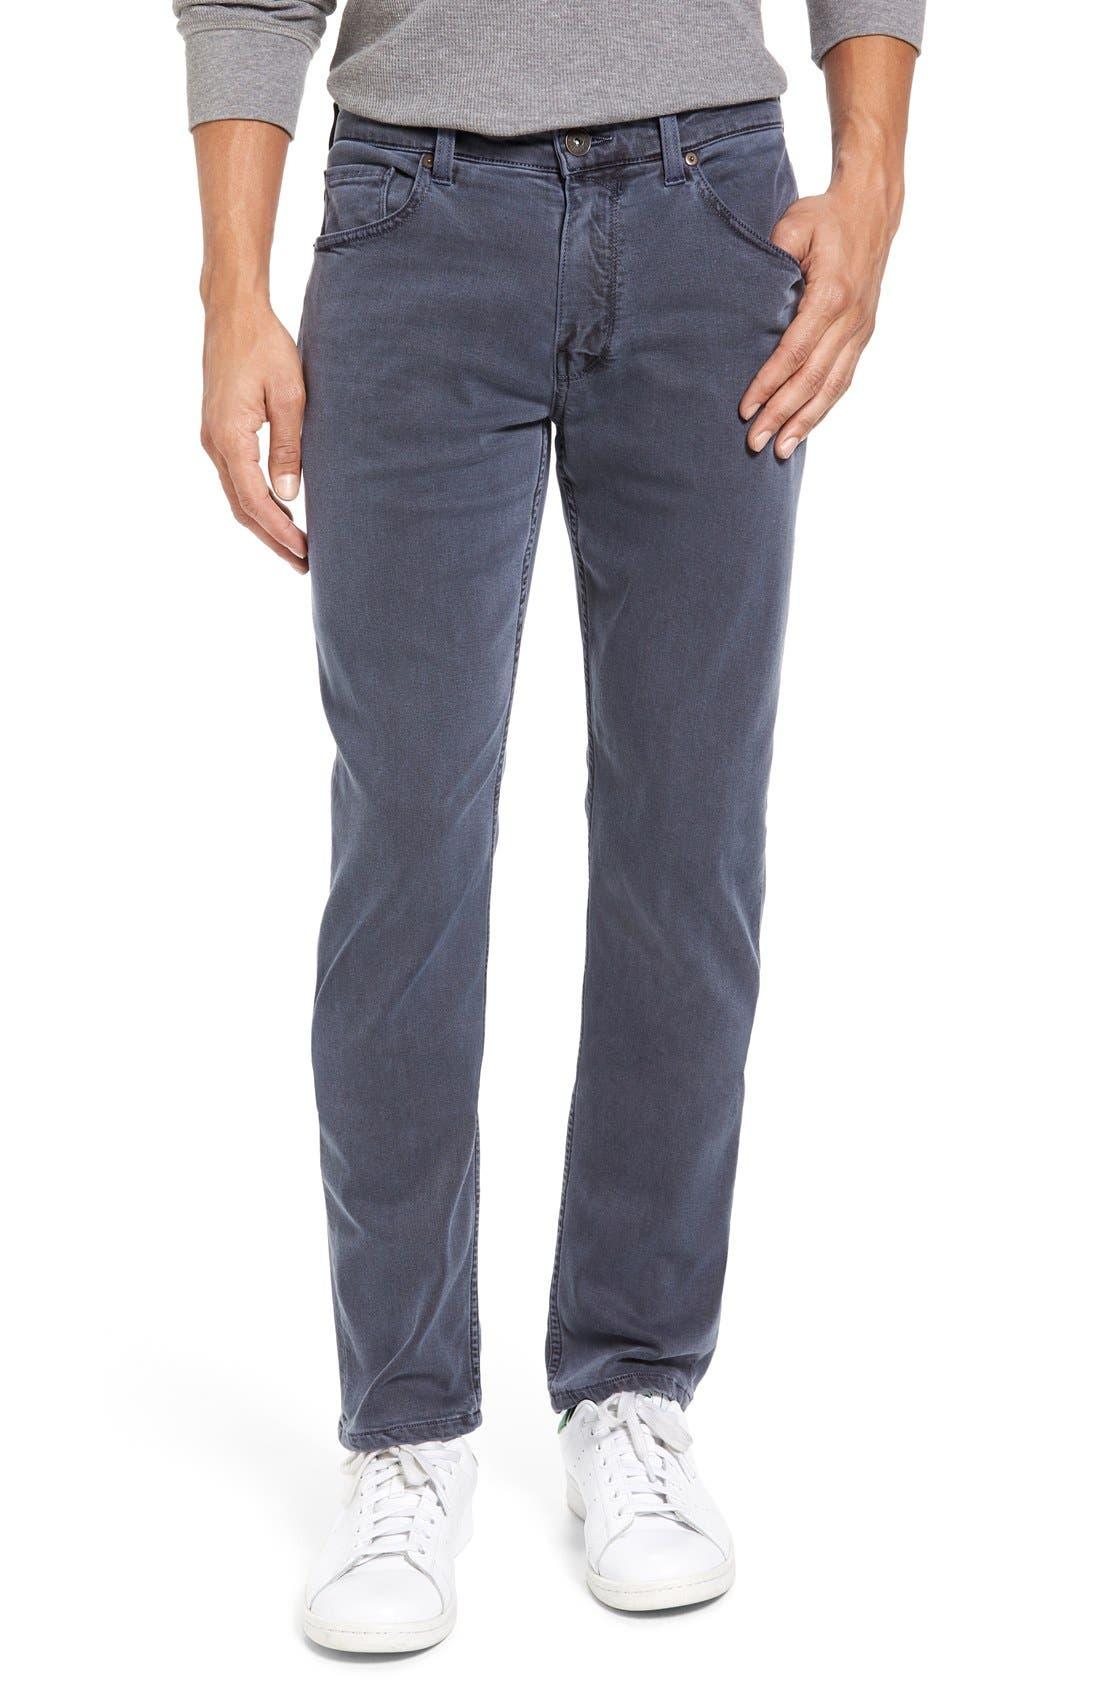 Transcend - Federal Slim Straight Leg Jeans,                             Main thumbnail 1, color,                             VINTAGE NAVY